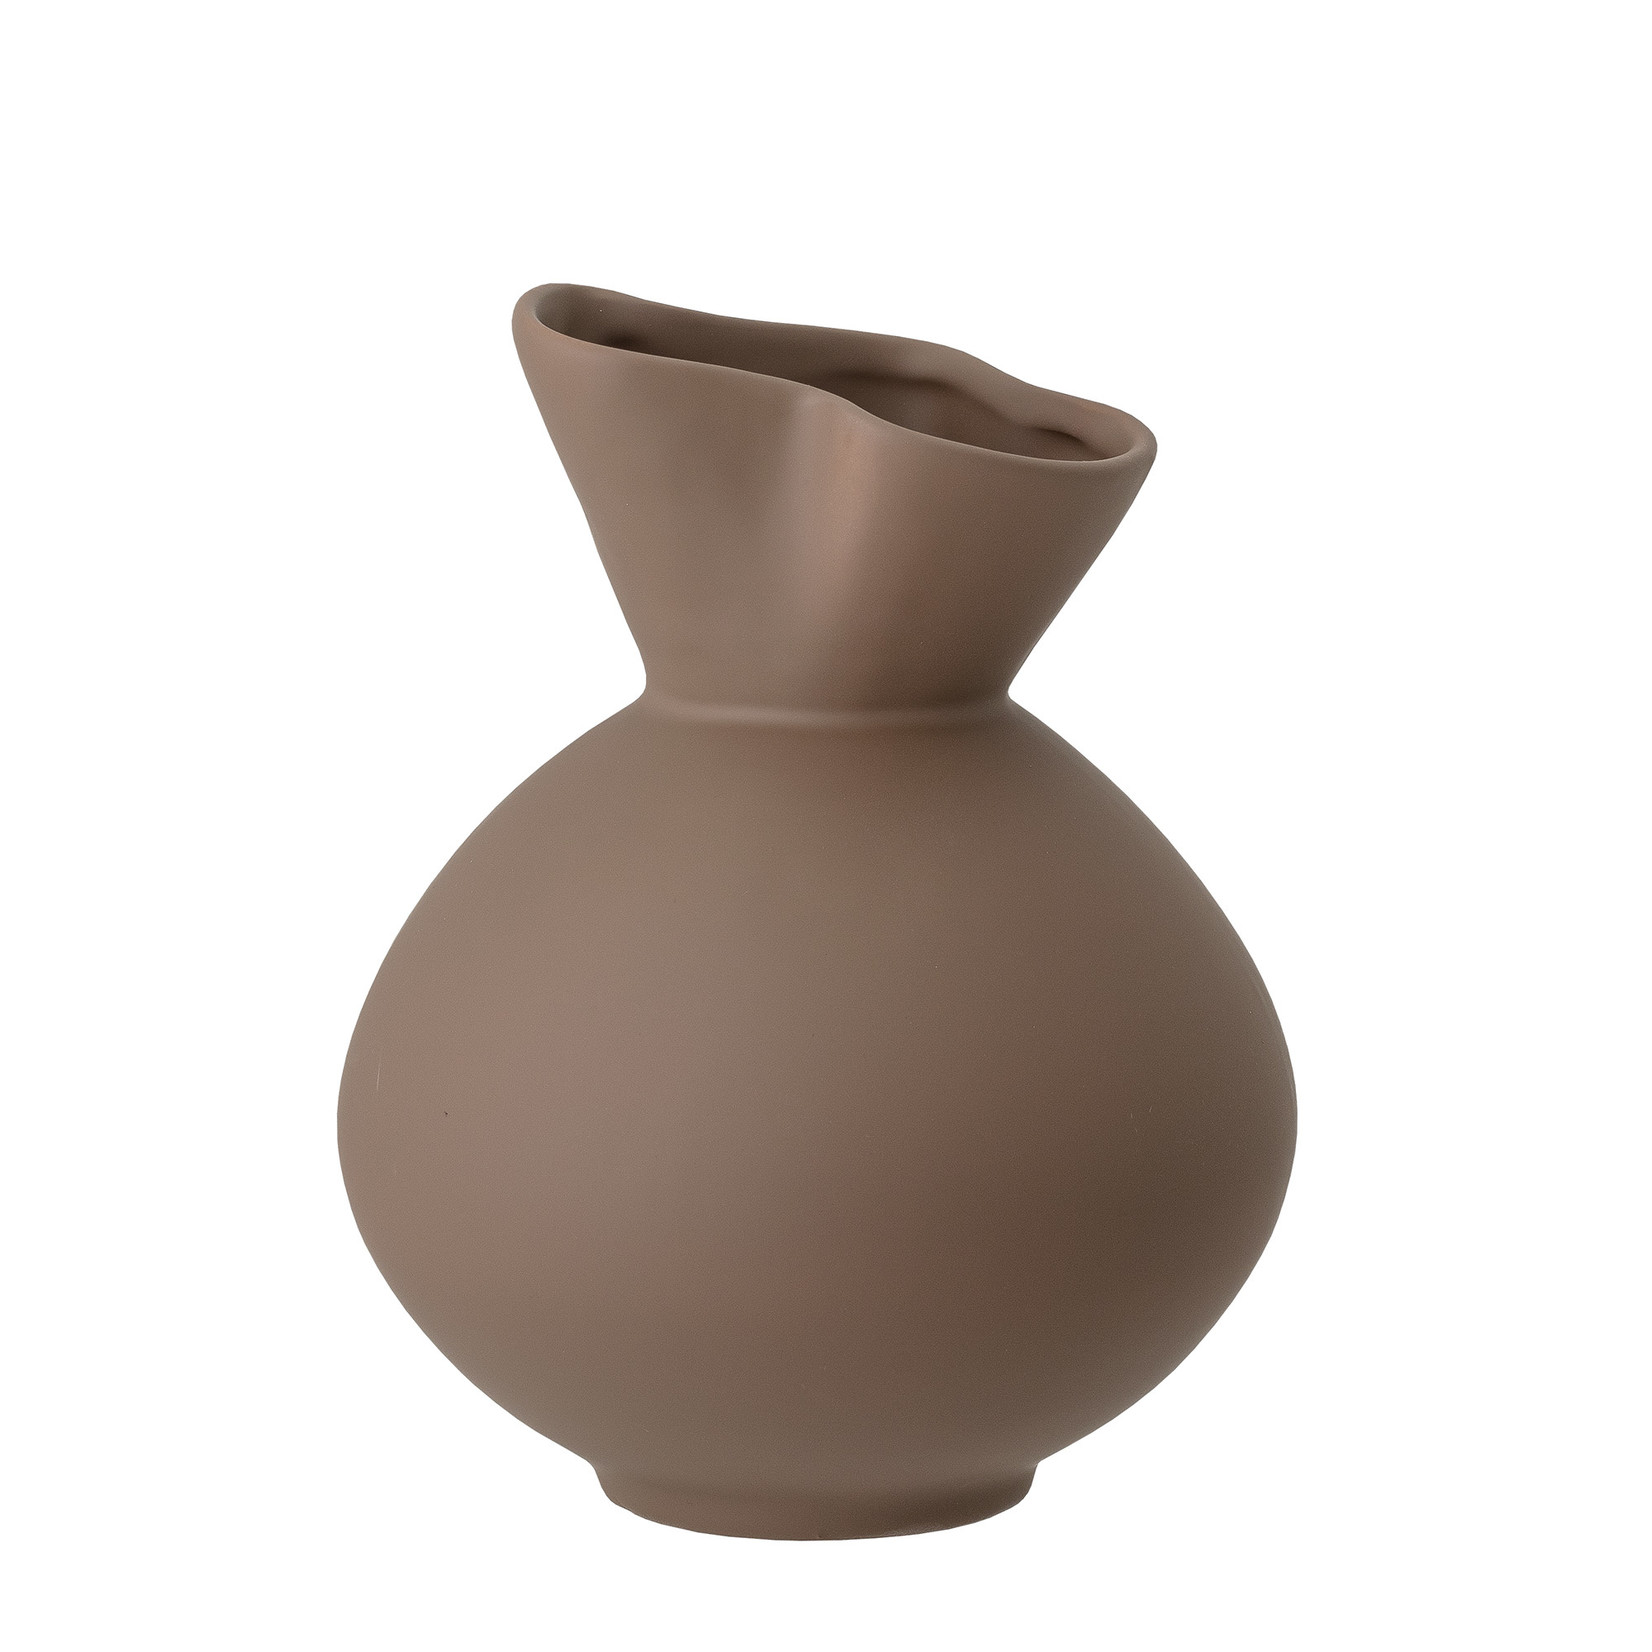 Bloomingville  Nica Vase, Brown, Stoneware